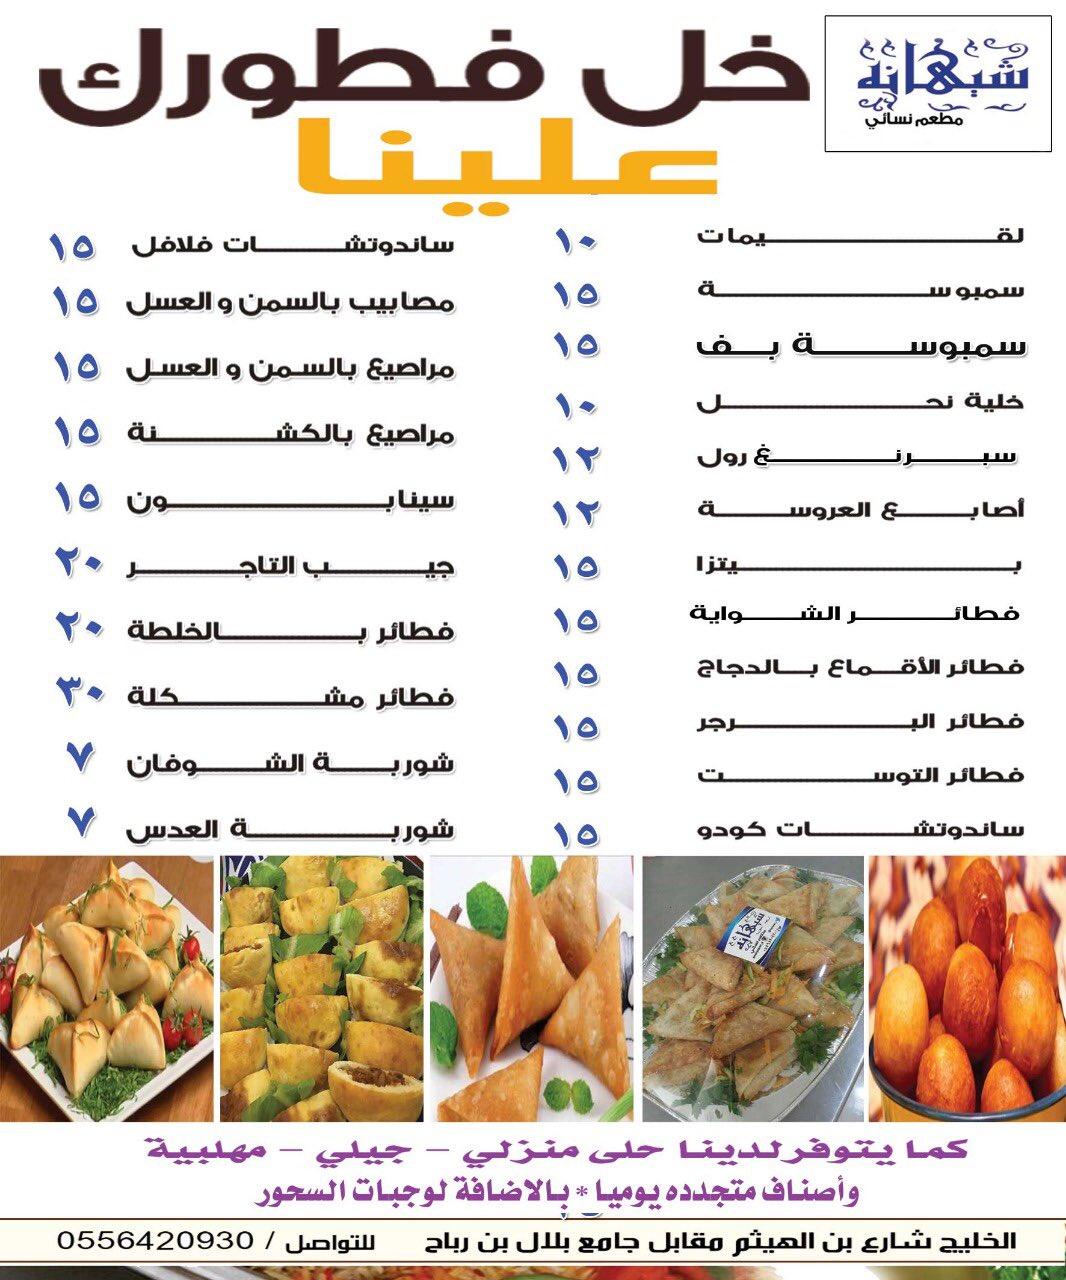 منيو مطعم شيهانه النسائي بالرياض